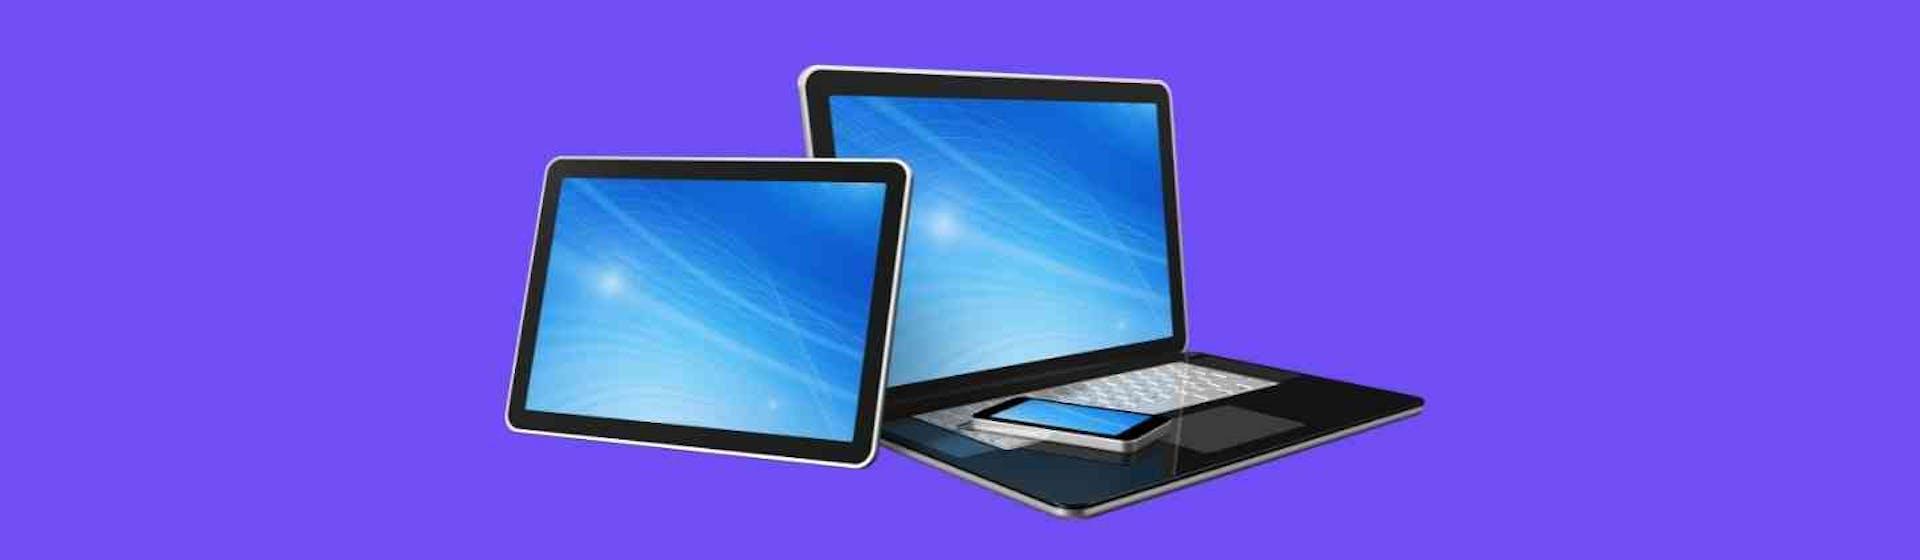 10 tipos de computador que todo aspirante a geek debe conocer